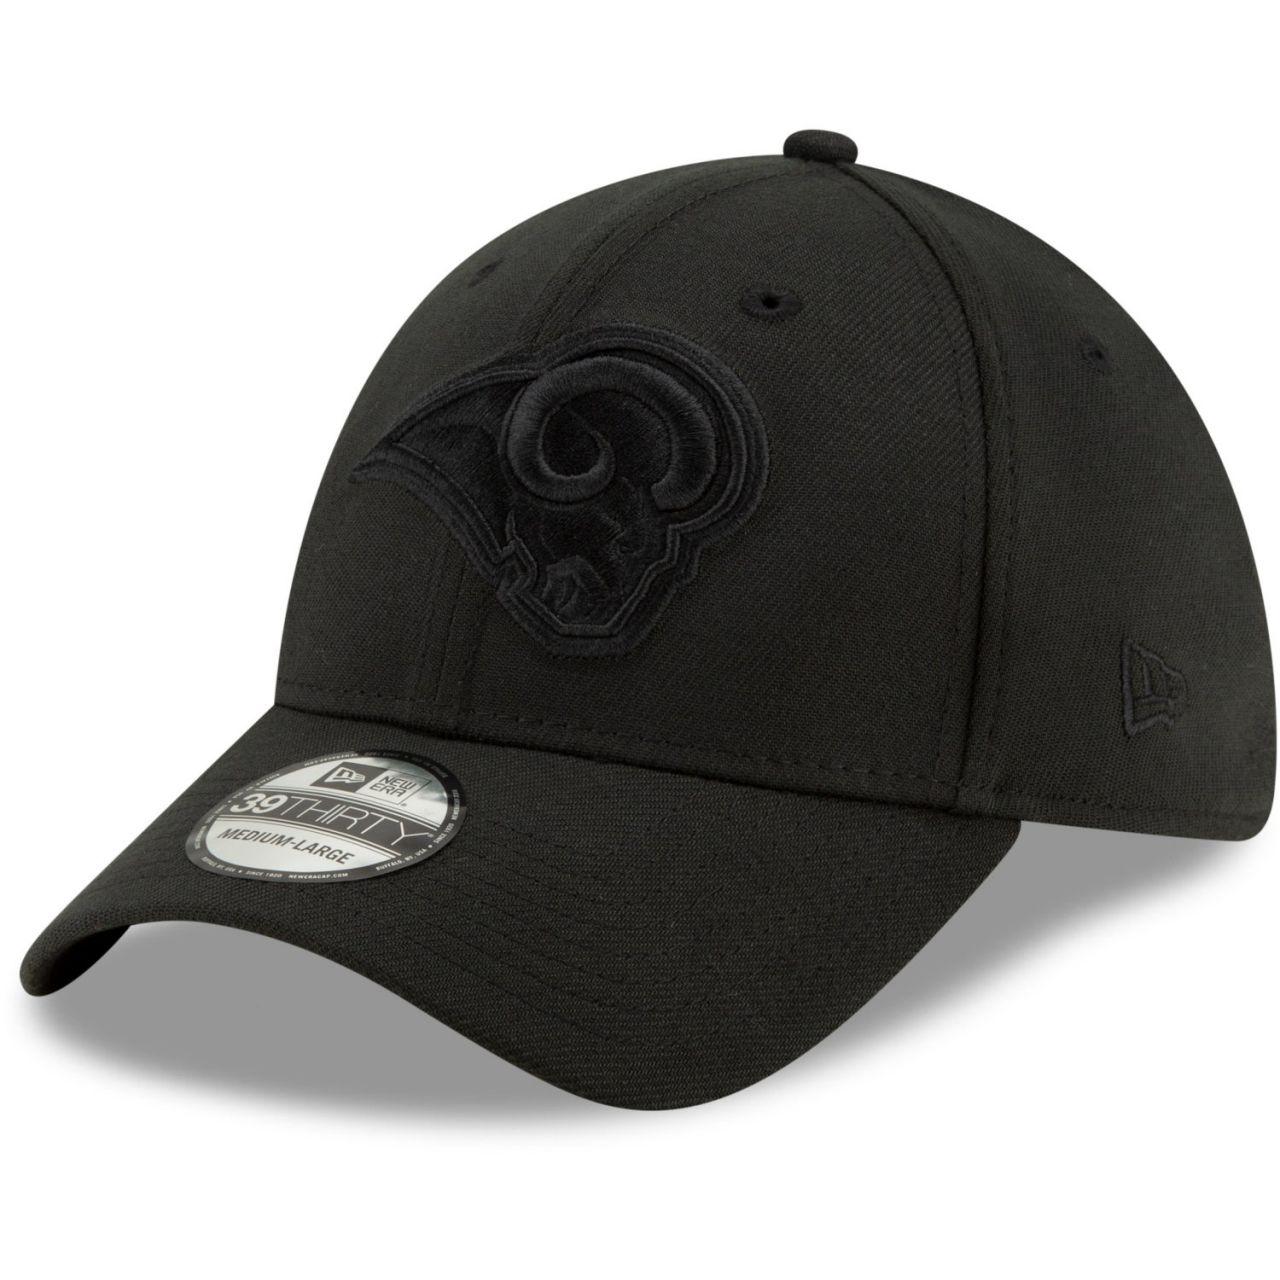 amfoo - New Era 39Thirty Stretch Cap - NFL Los Angeles Rams